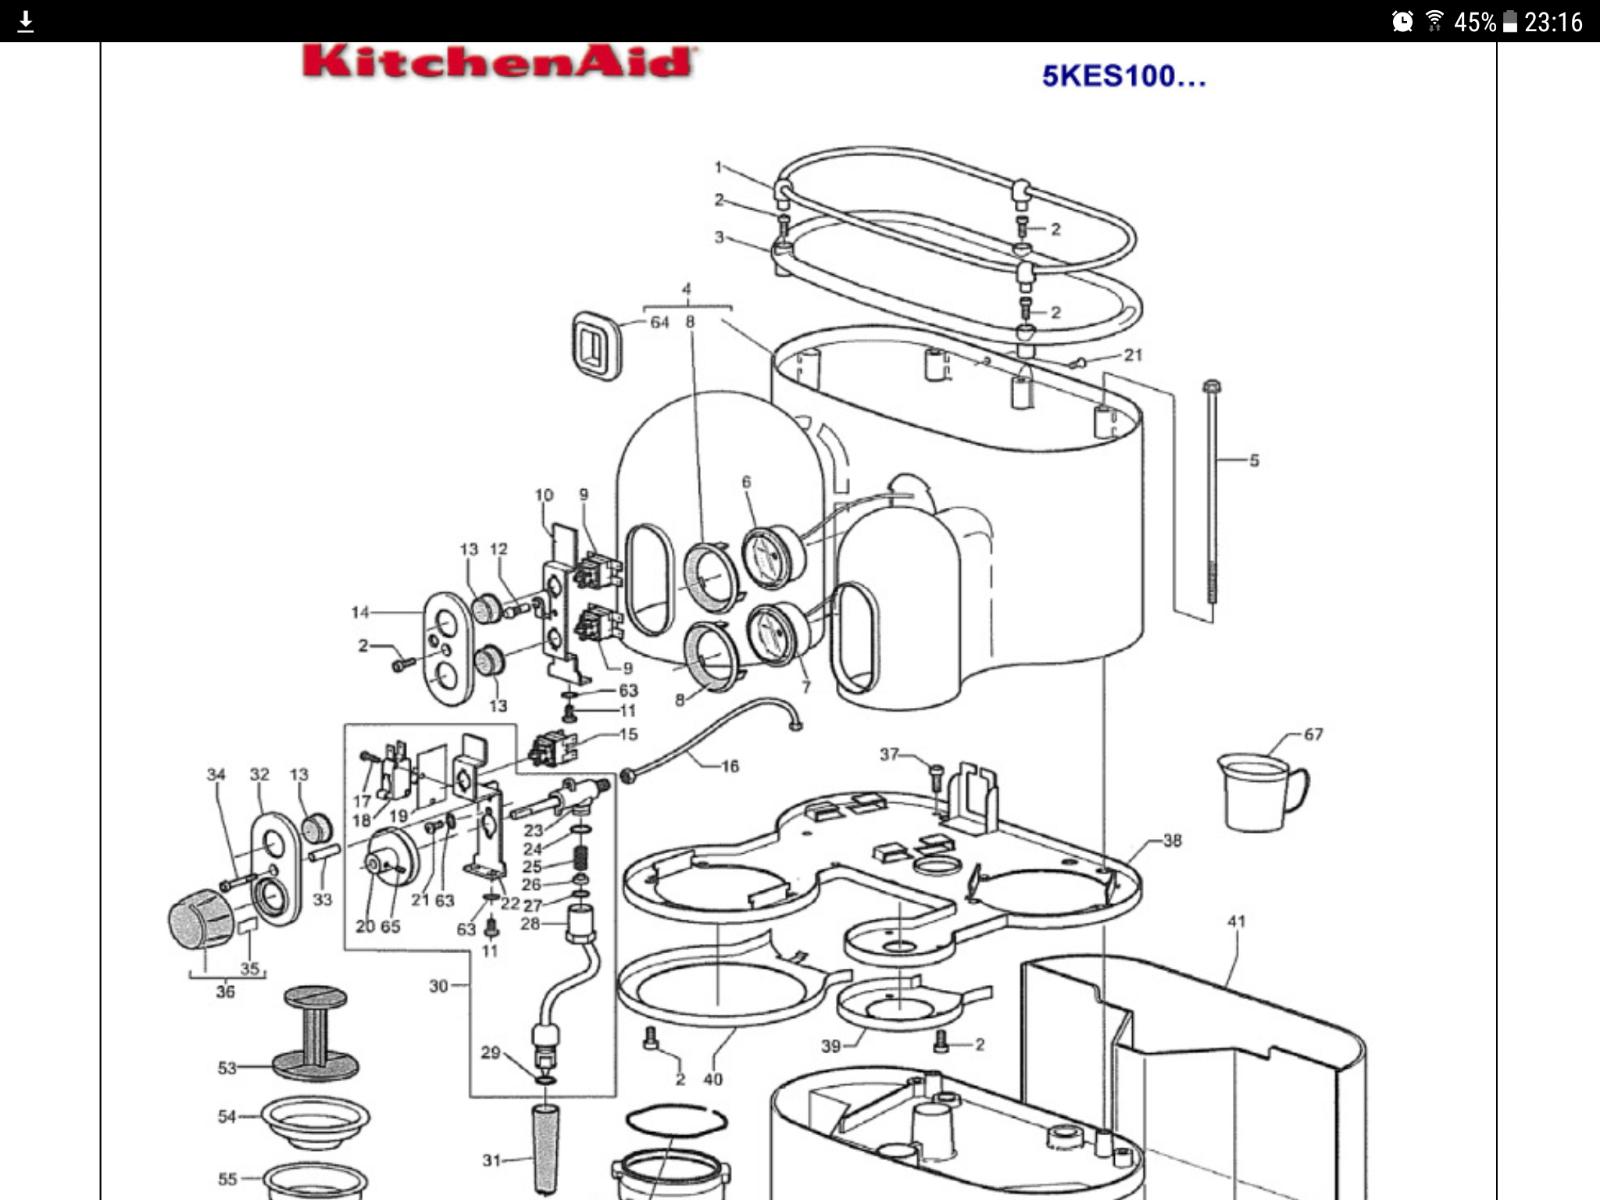 KitchenAid Artisan 5KES100 Coffee 16x O Ring Full Service kit + Group Gasket Opv 5